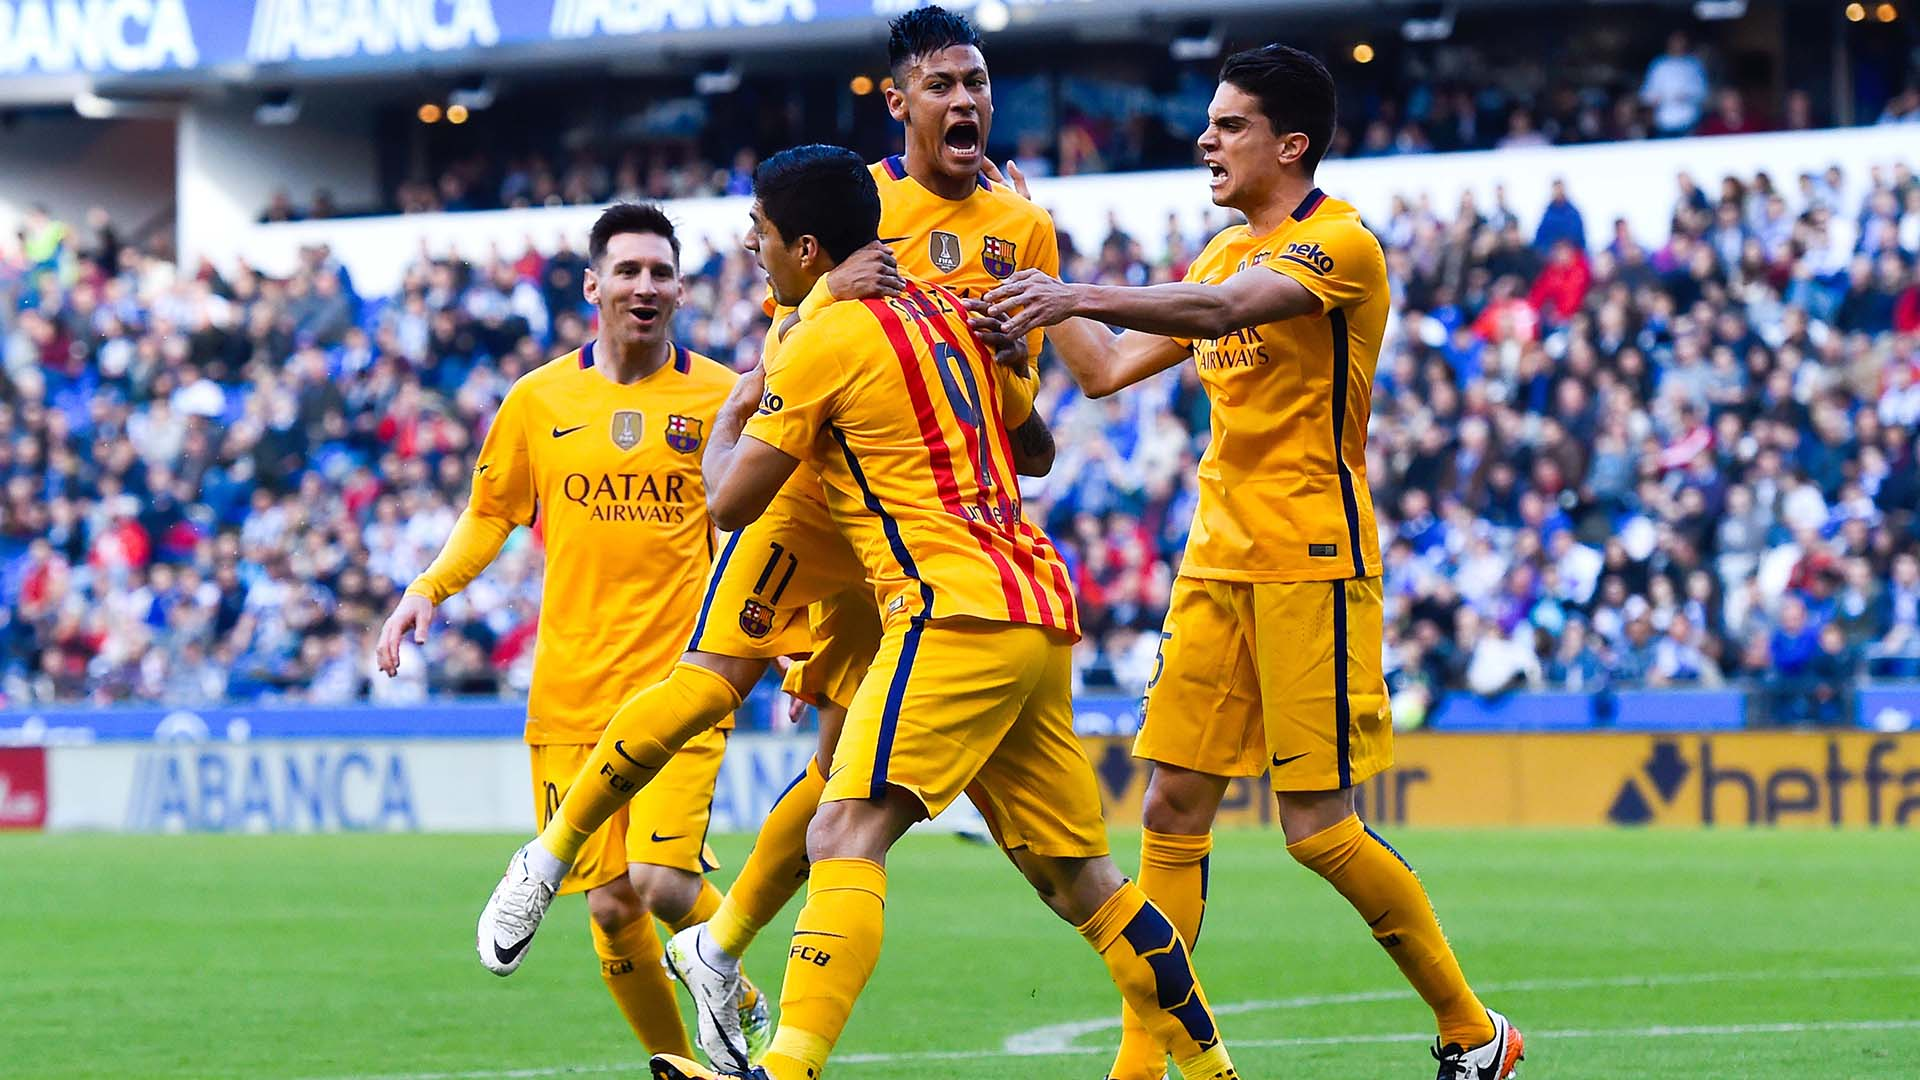 هفته سی و چهارم لالیگا :بارسلونا 8 دیپورتیوولاکرونیا 0 ، برد 3 بر 0 رئال مادرید برابر ویارئال